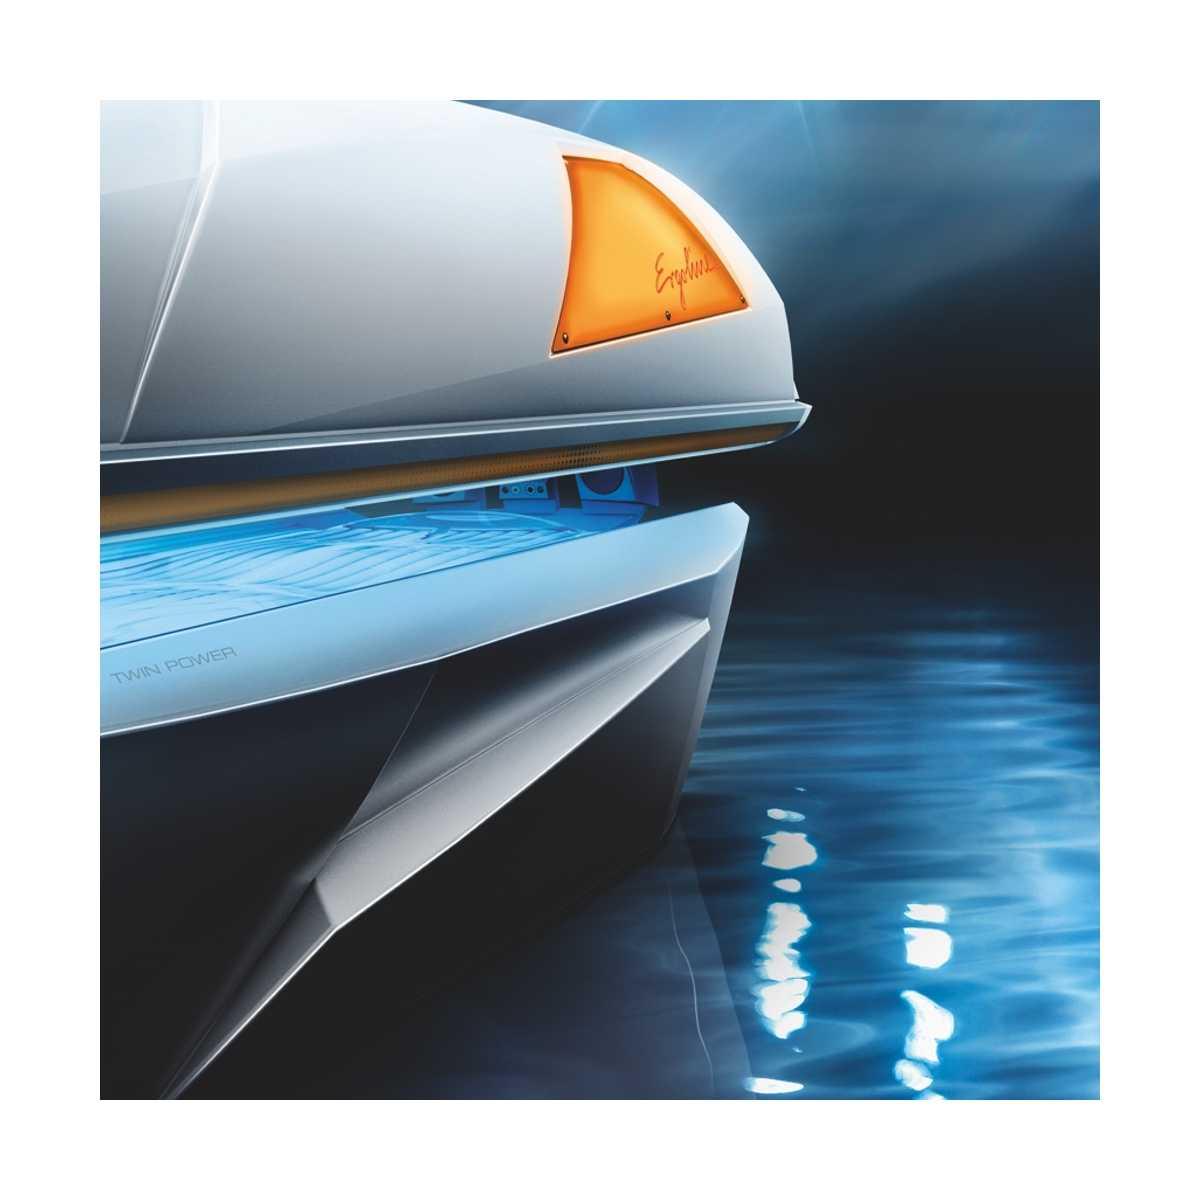 Ergoline Passion 350 S-Super Power - Ergoline - Ergoline